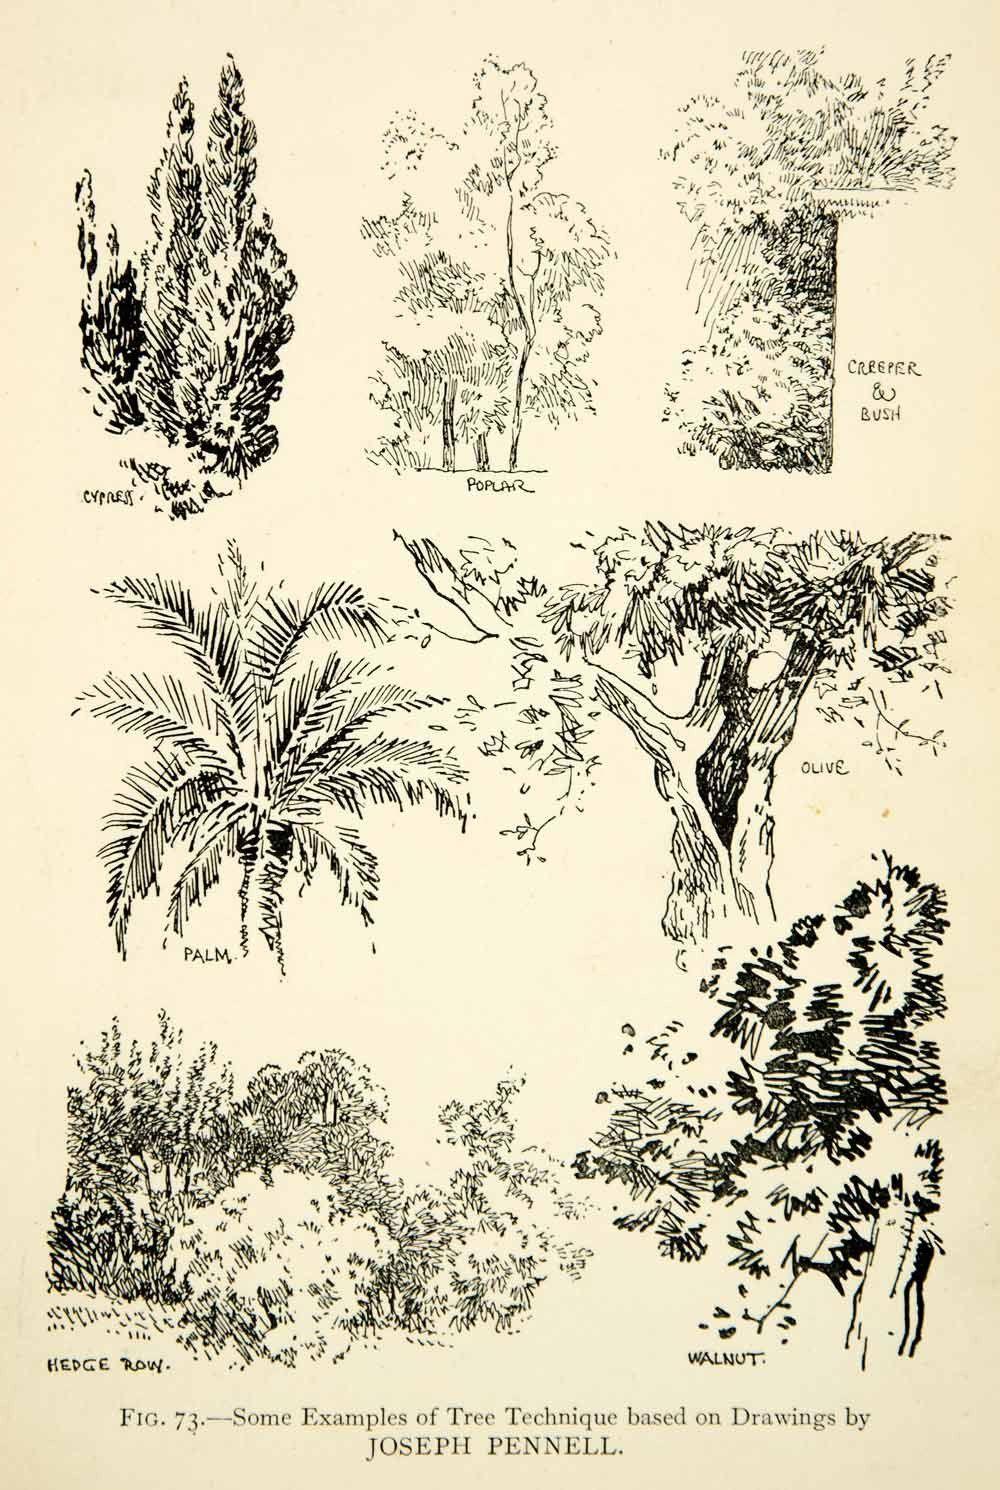 1927 Print Tree Technique Drawing Joseph Pennell Foliage Cypres Poplar XDH1